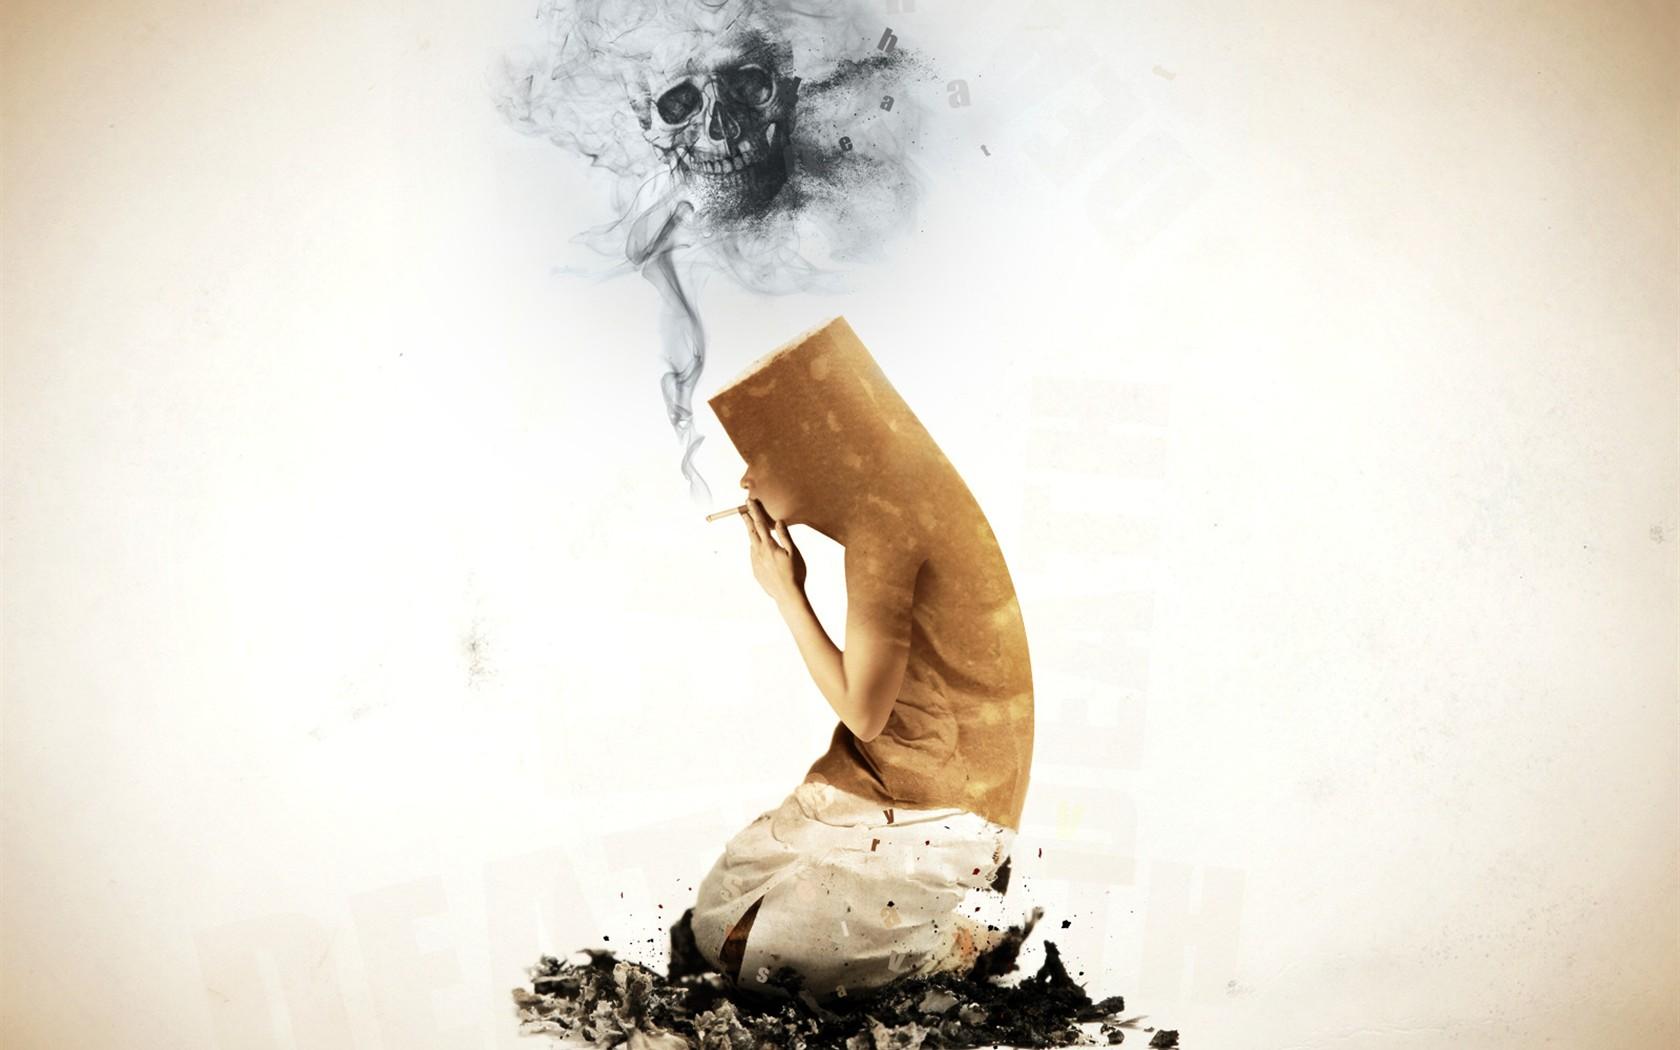 Леденцы чтобы бросить курить цена